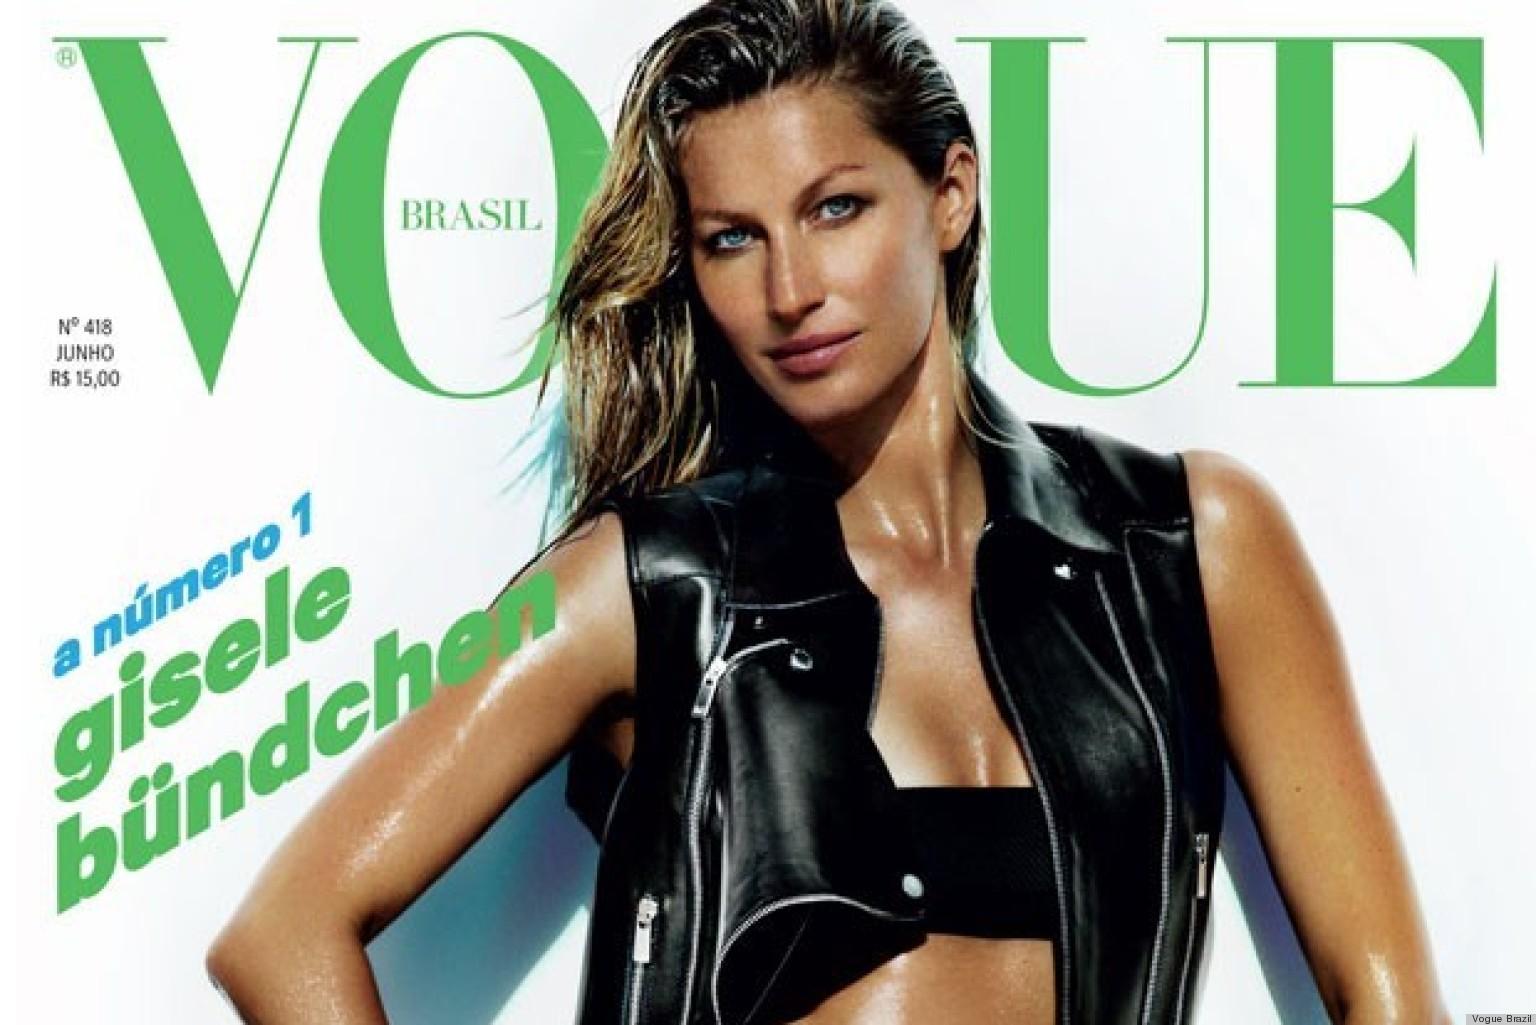 Gisele Bundchen Vogue Brazil Cover Is Sweaty, Pantsless ... Gisele Bundchen Facebook